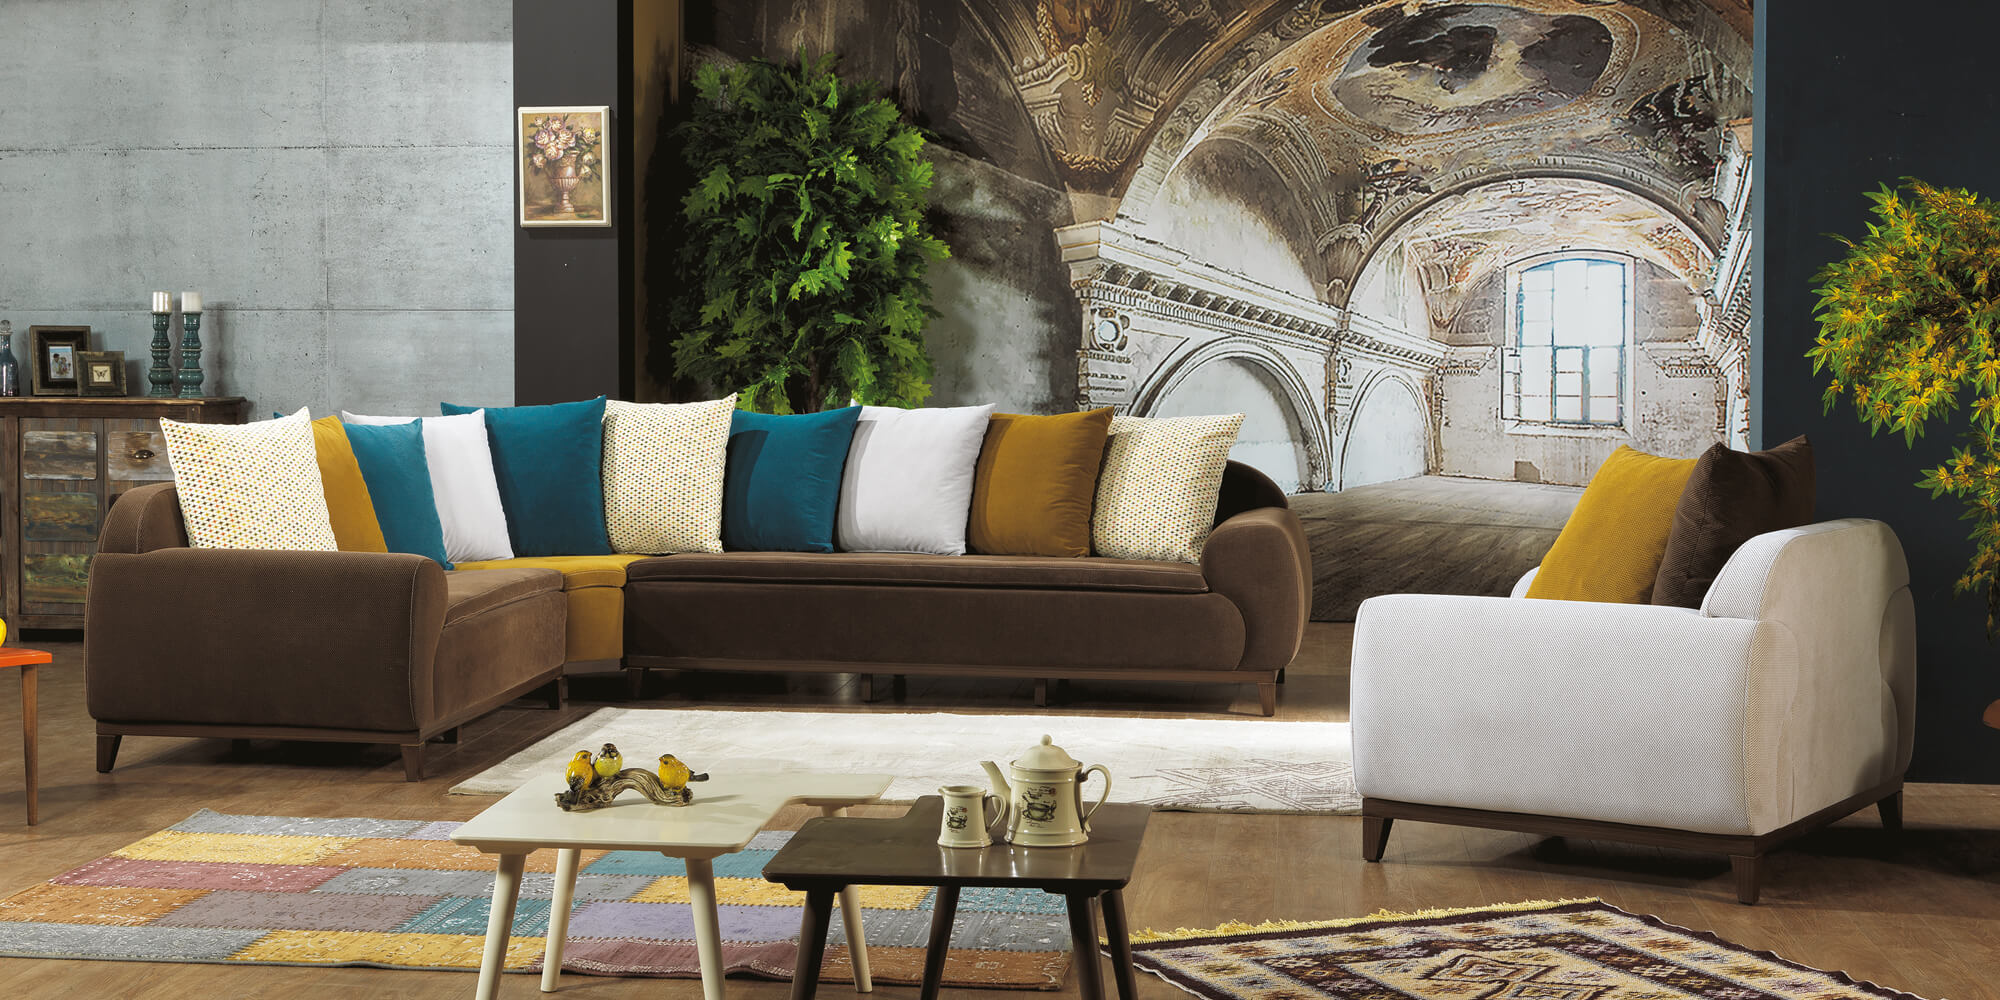 koza sitzecke yuvam m belhaus in wuppertal cilek offizieller h ndler in europa. Black Bedroom Furniture Sets. Home Design Ideas